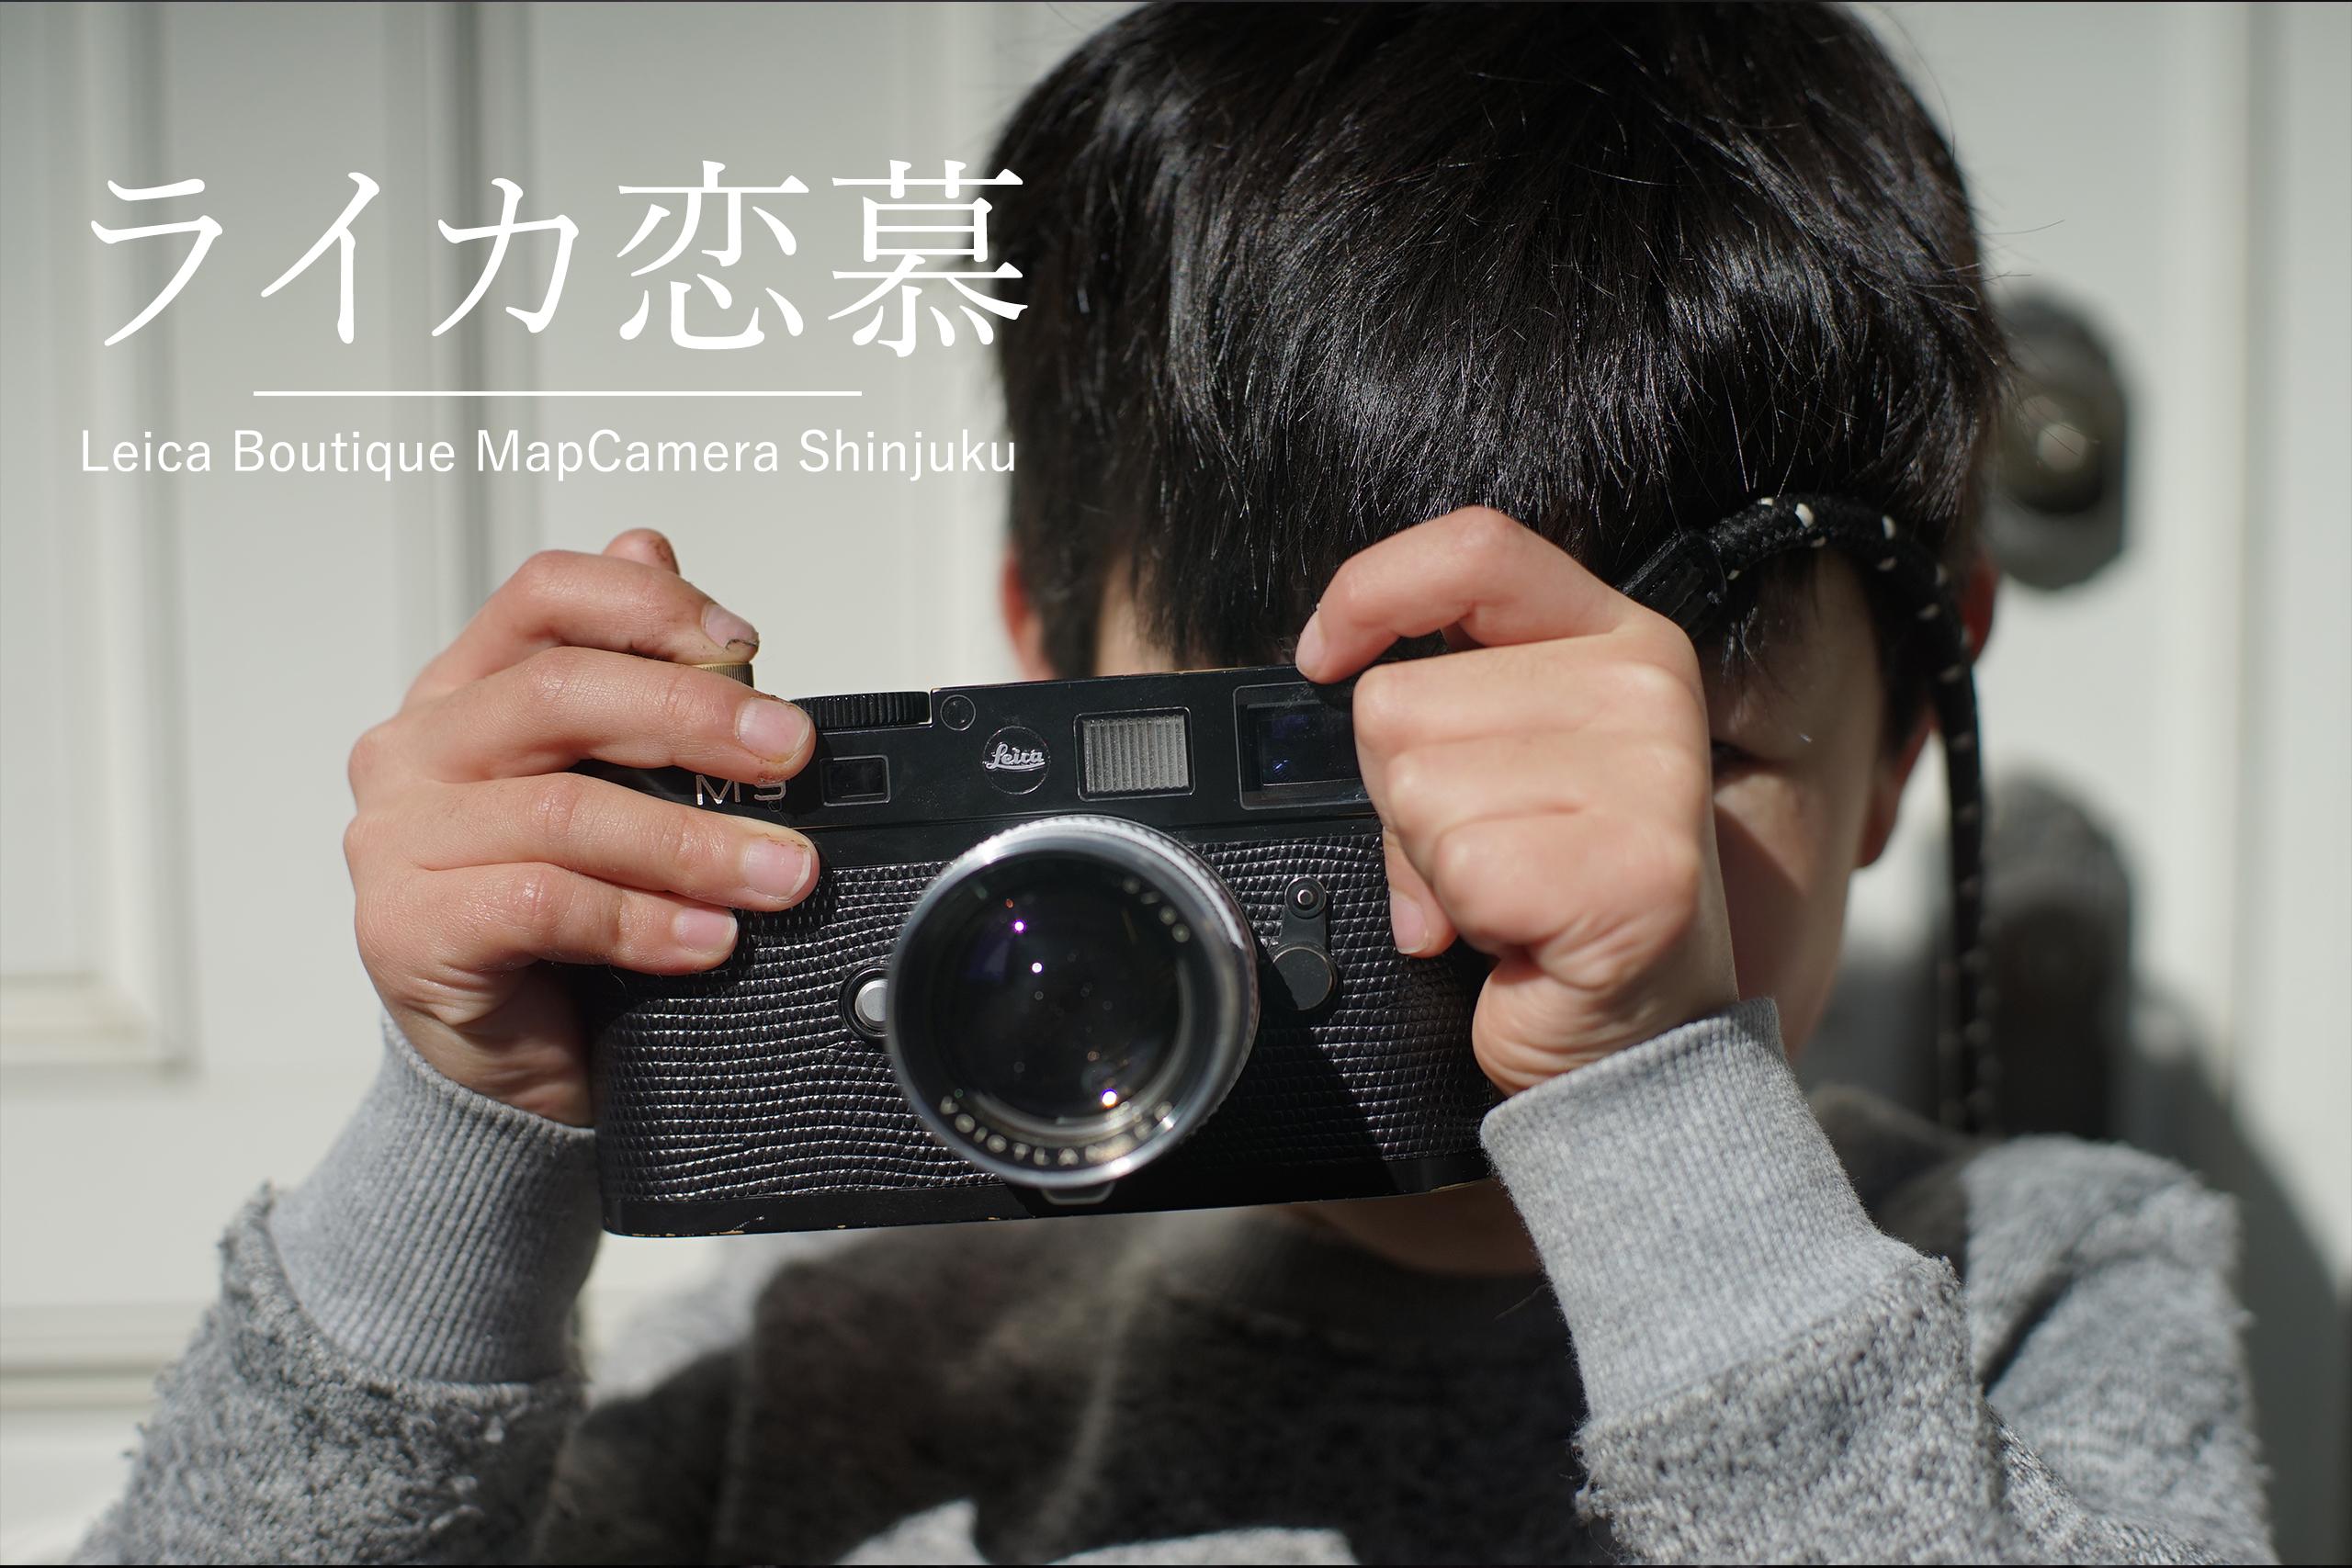 【Leica Boutique MapCamera shinjuku 8th】私のLeica M9 愛